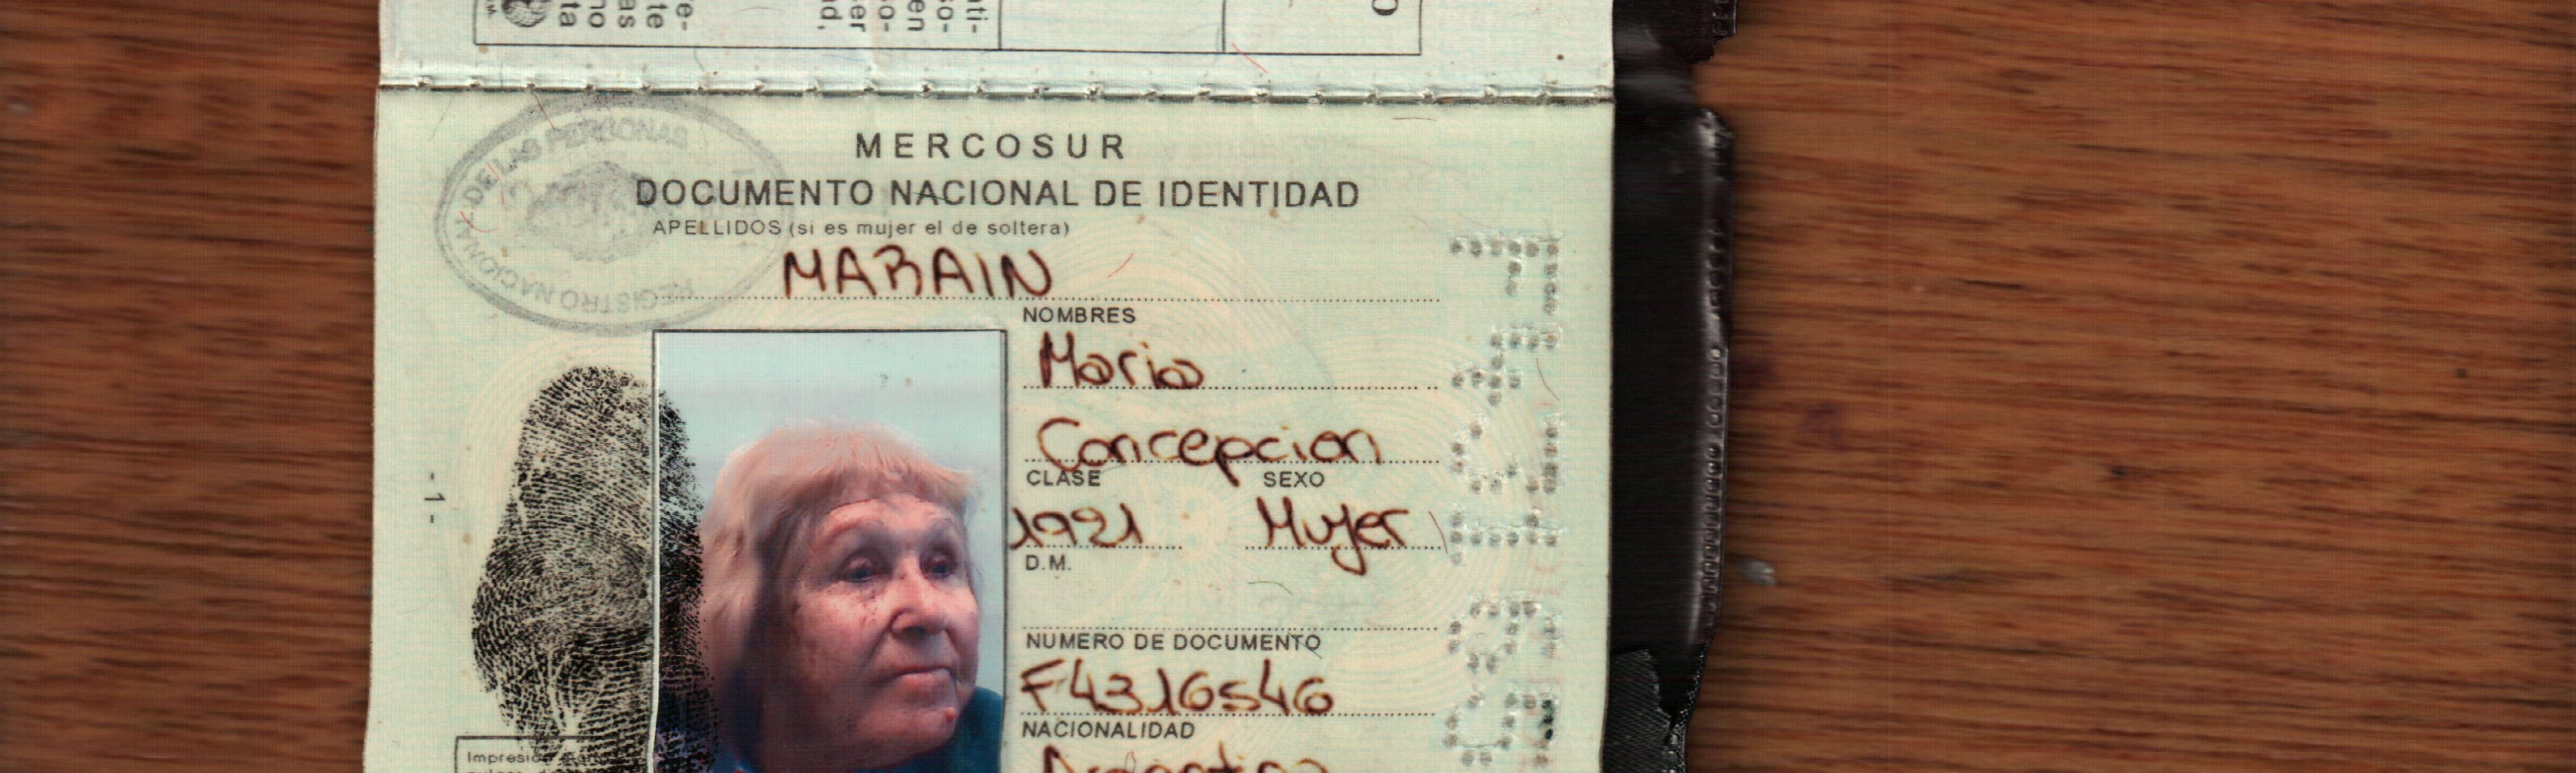 prima novias de internet voyeur en Burgos